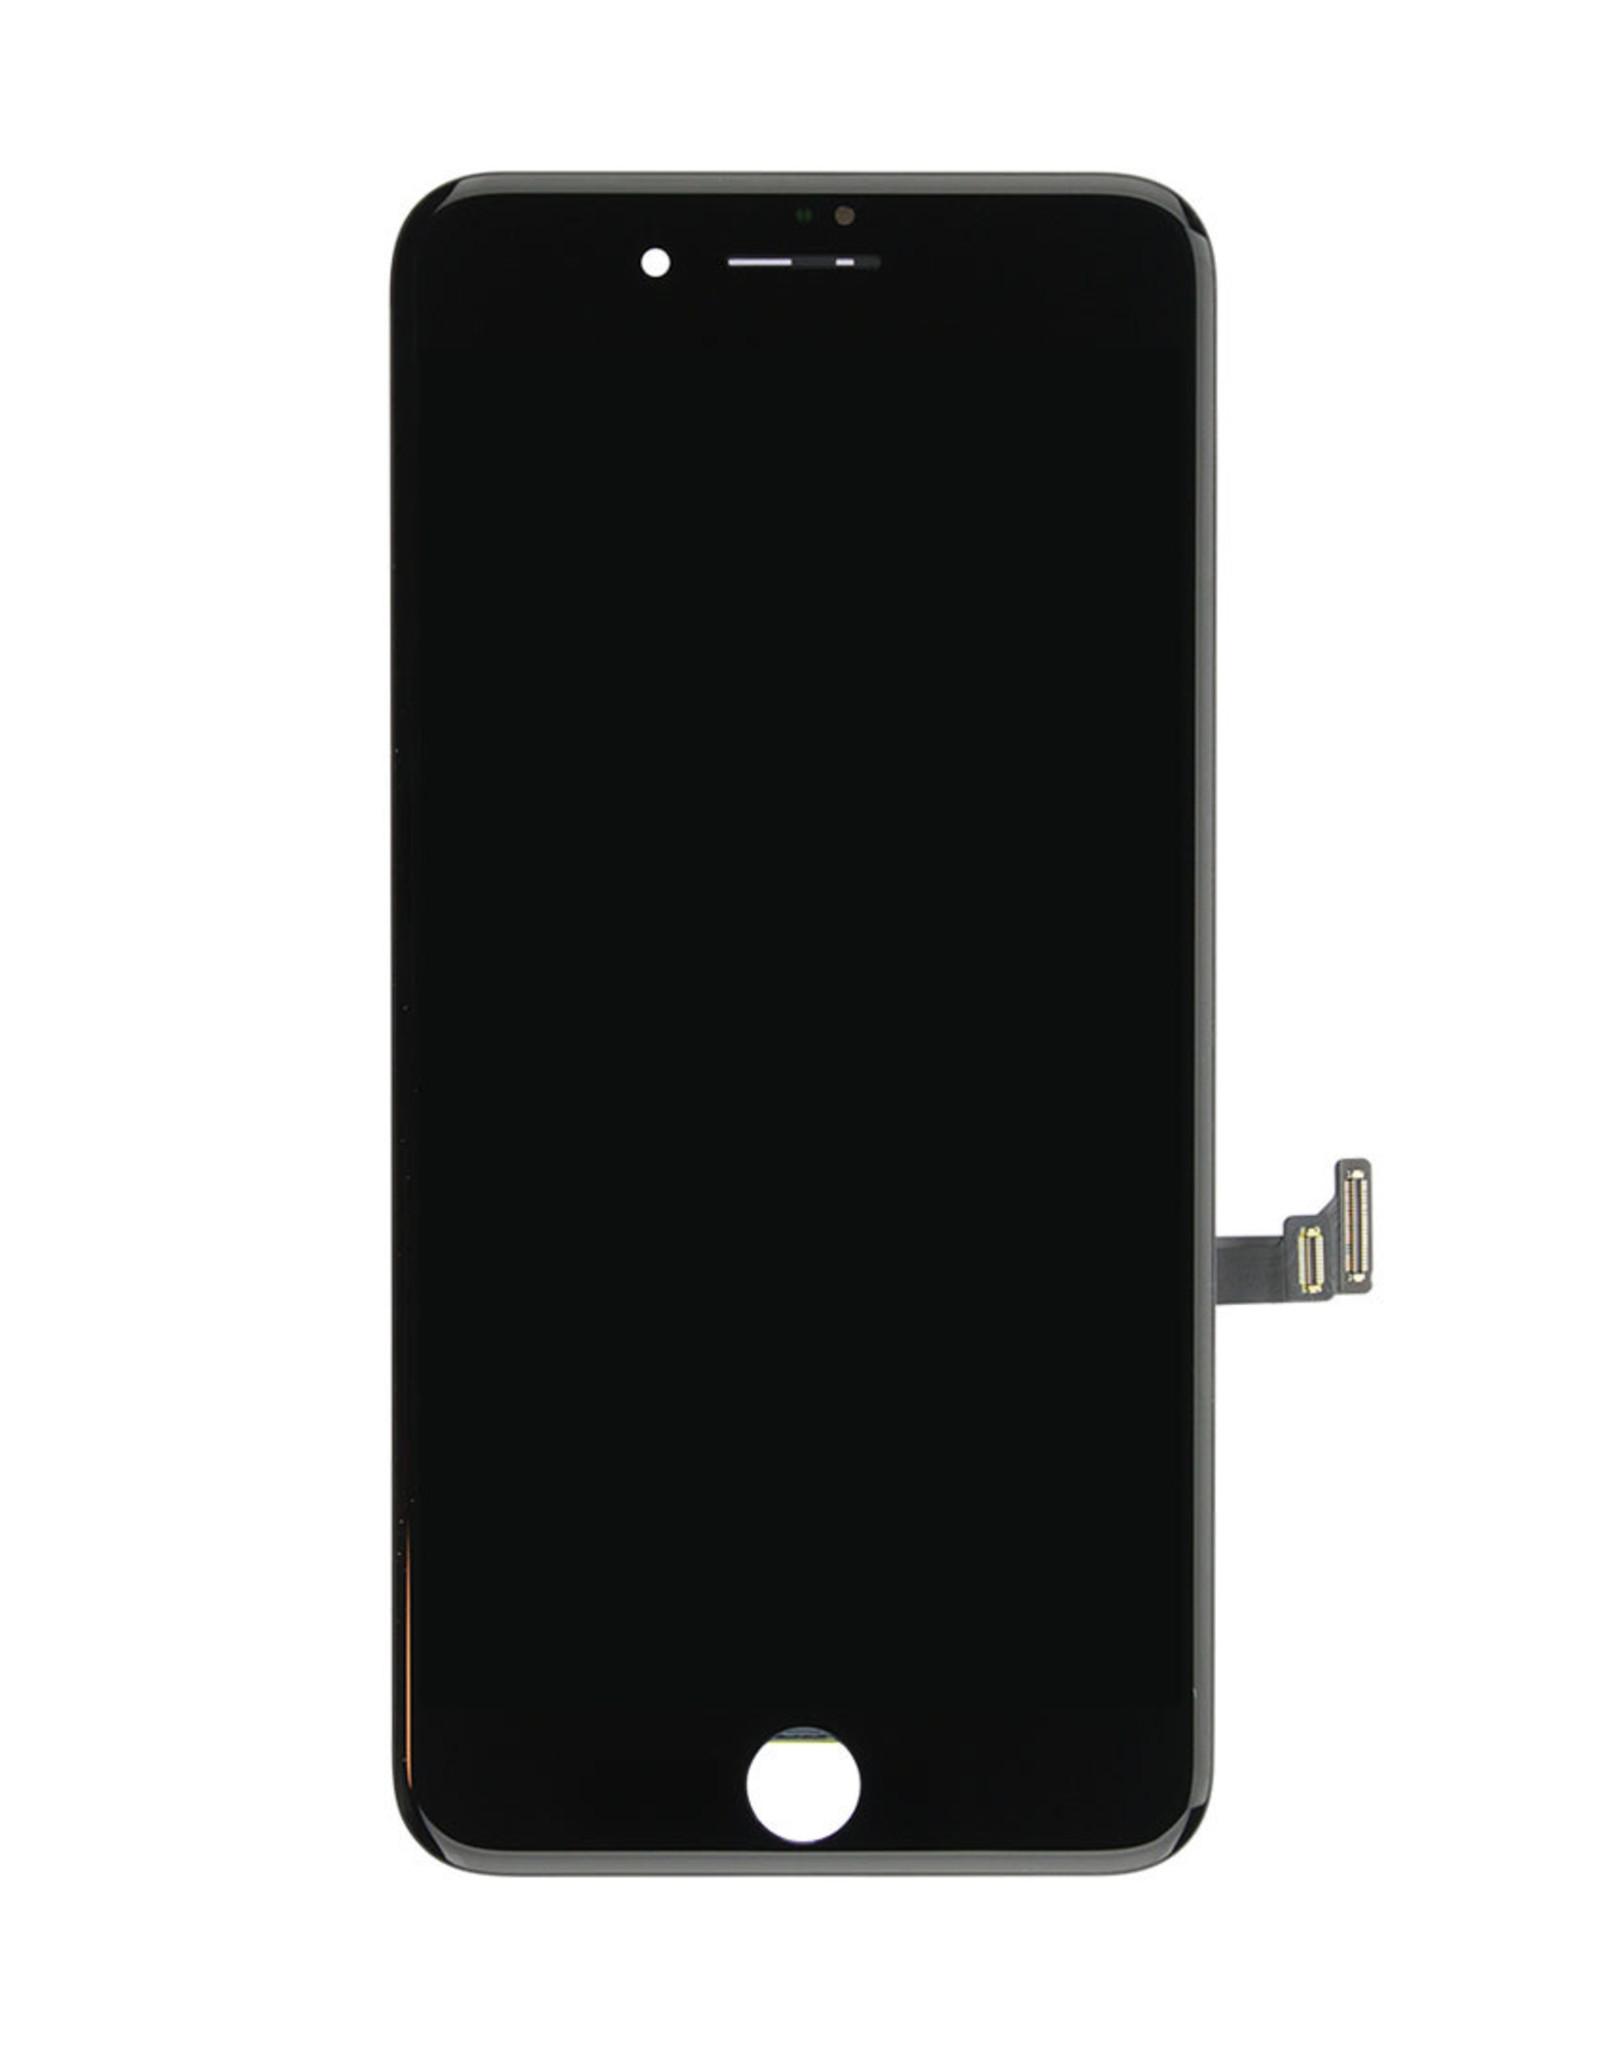 Apple iPhone 8 Plus (Black) Lcd Screen Replacement OEM